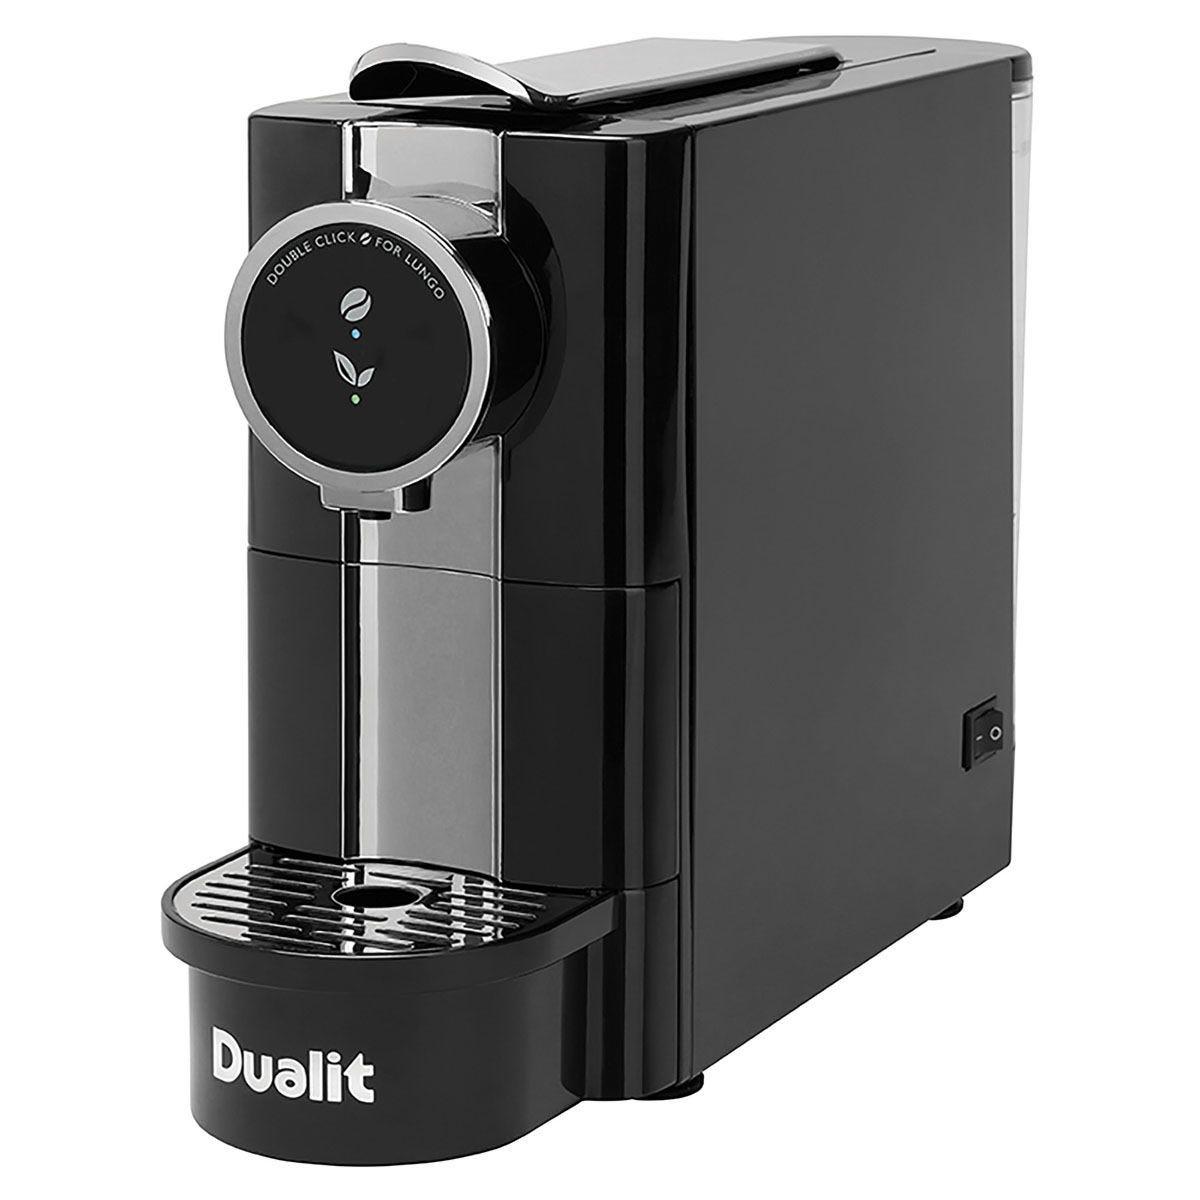 Dualit 85181 Cafe Plus Nespresso–Compatible Capsule Machine – Black